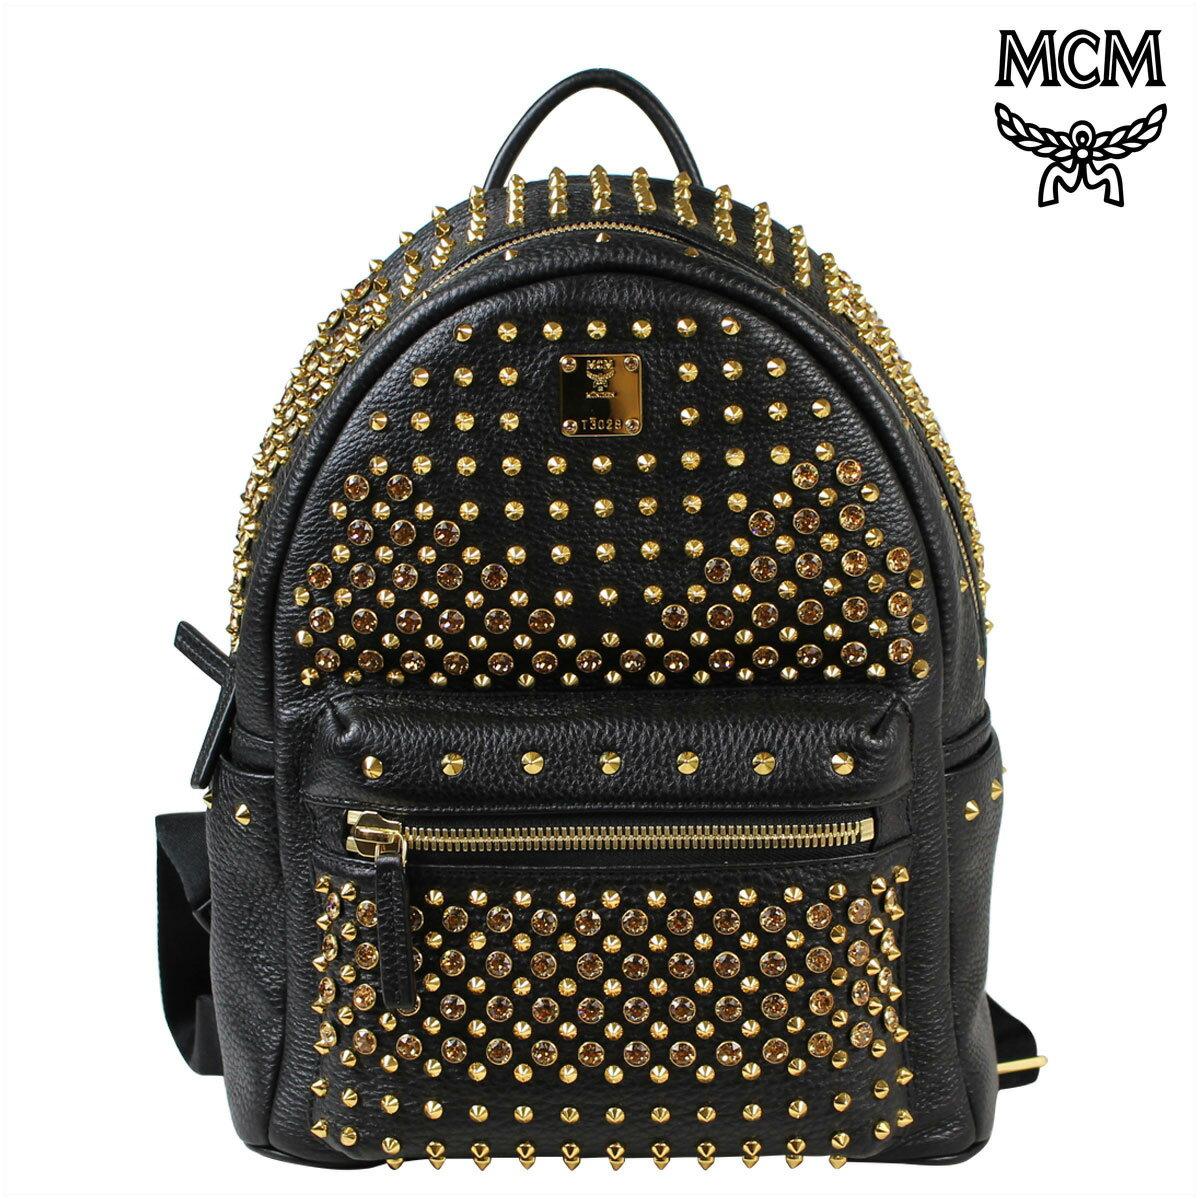 【SOLD OUT】 MCM エムシーエム バッグ リュック バックパック MMK 5SVE73 BK001 ブラック レディース